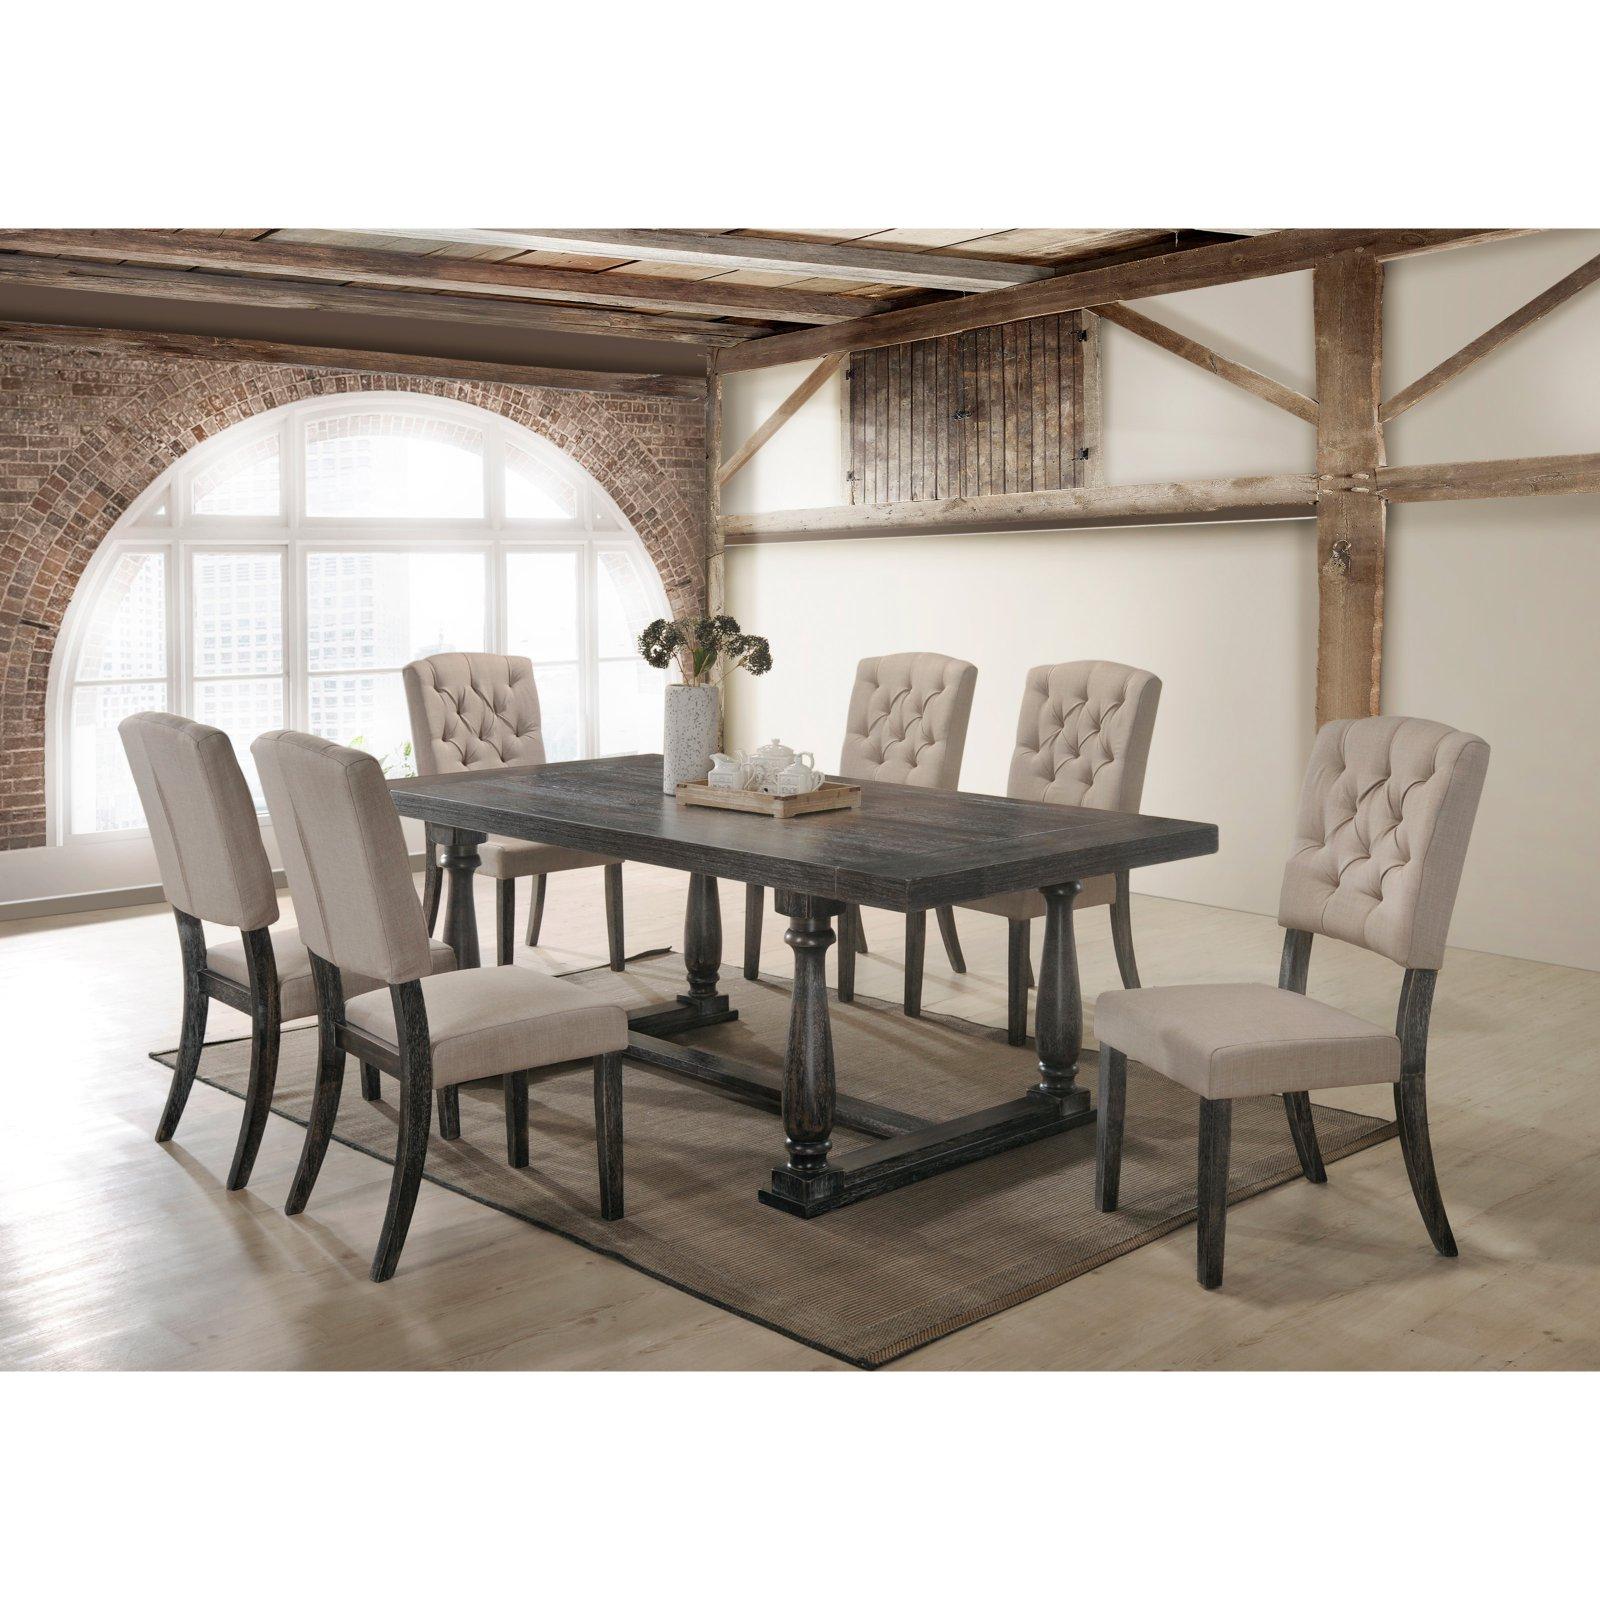 Best Master Furniture Katrina 7 Piece Dining Set Dining Room